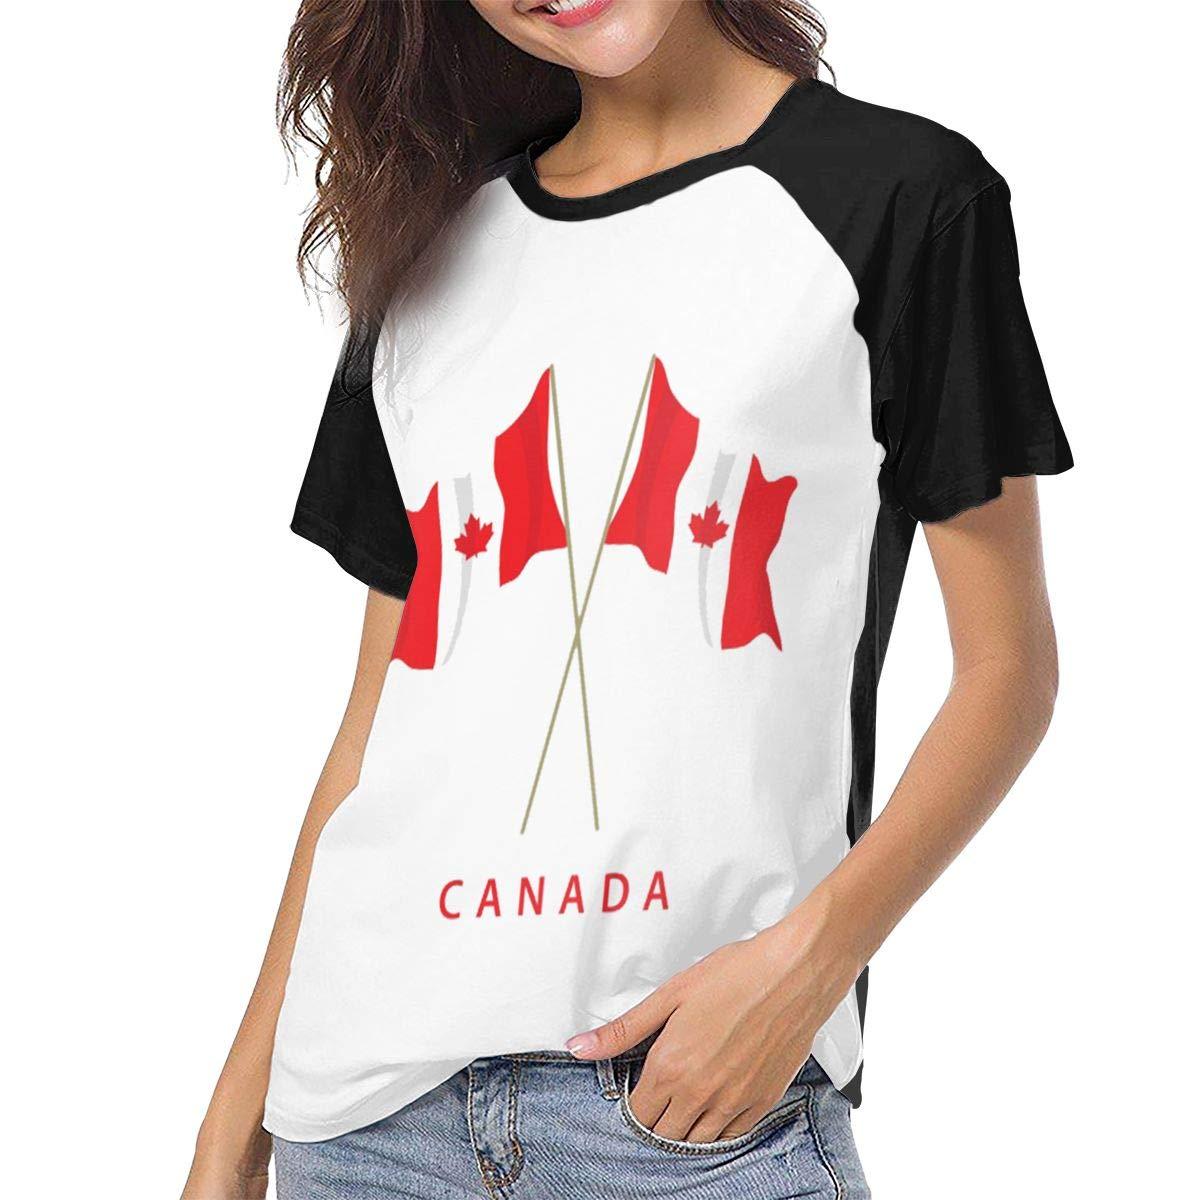 QWXZC Canadian Maple Leaf Womens Short Sleeves Baseball Tee Casual Raglan Shirt Baseball Raglan T-Shirt.Black.